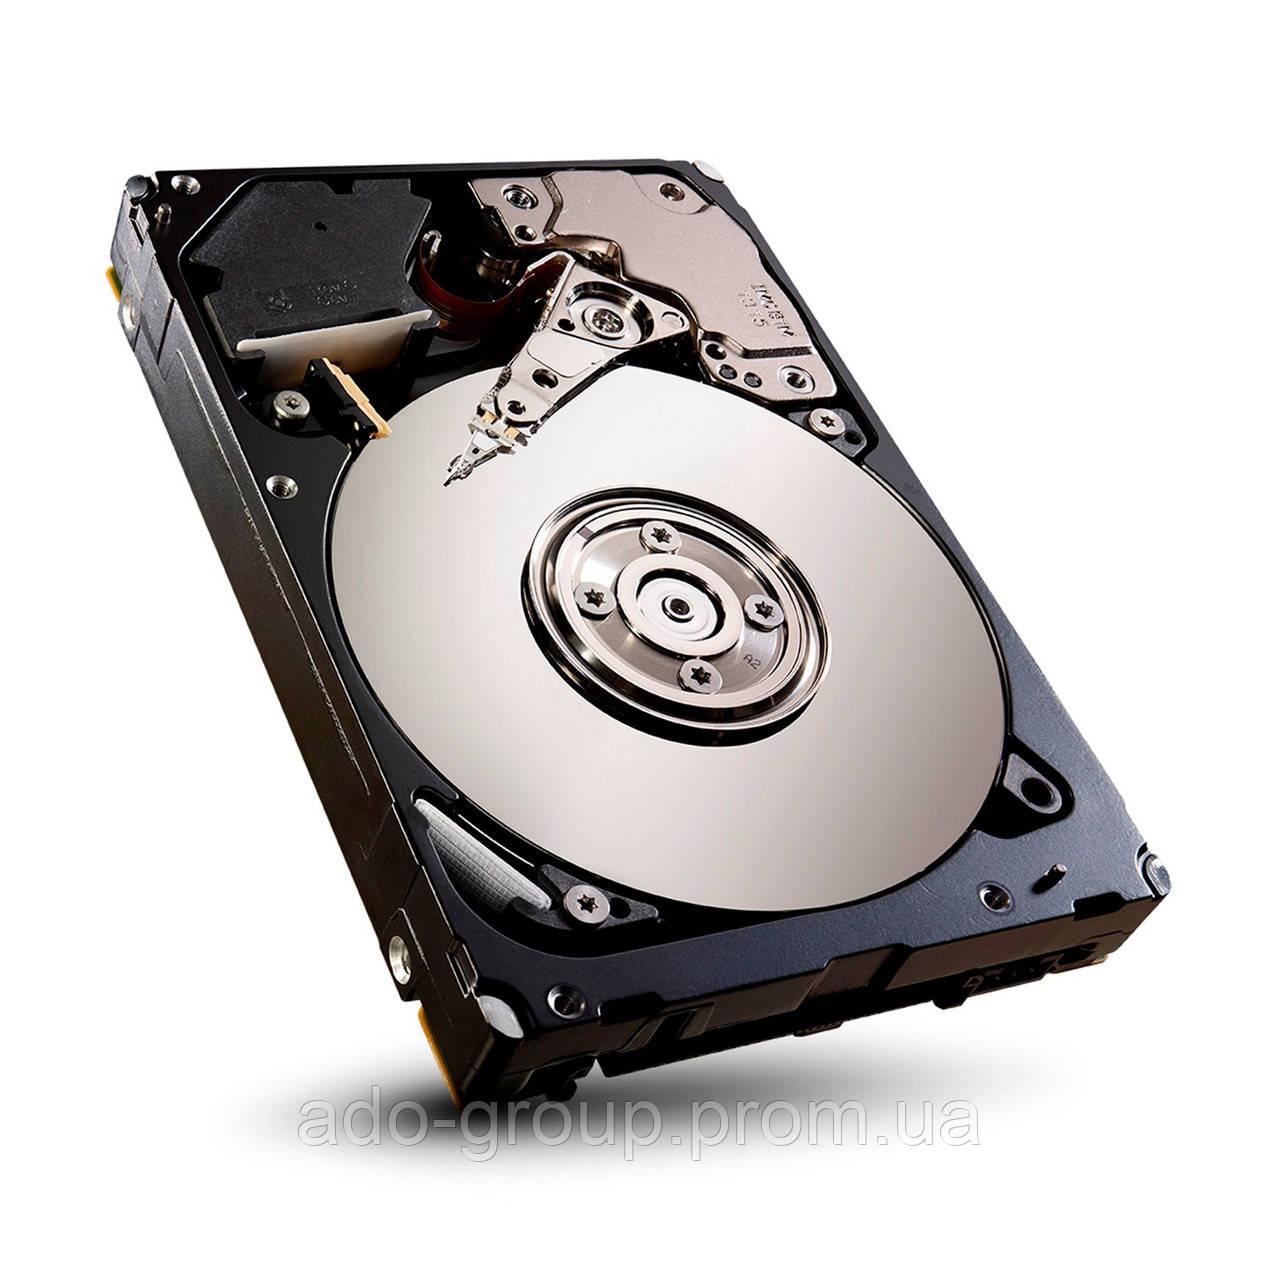 "C549P Жесткий диск Dell 1000GB SAS 7.2K  3.5"" +"